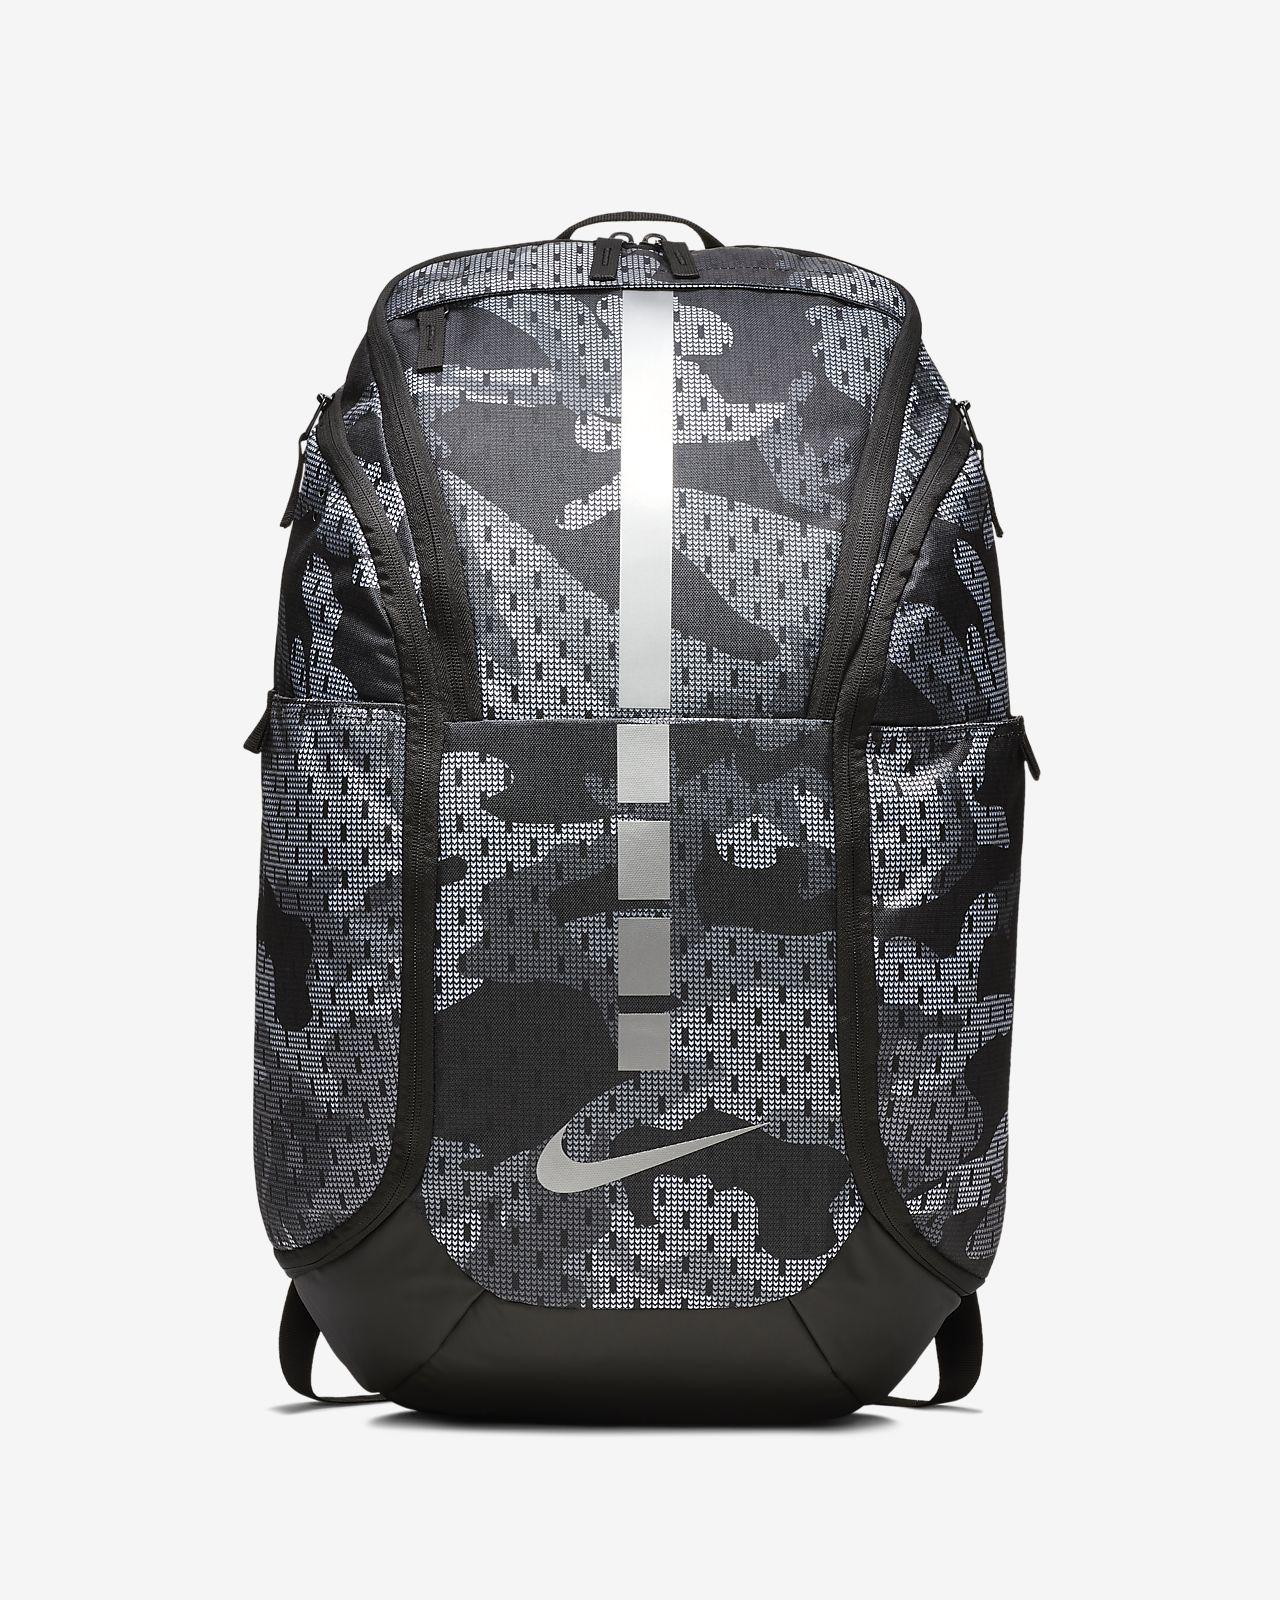 b2dfdd7d51c3 black nike elite backpack Sale